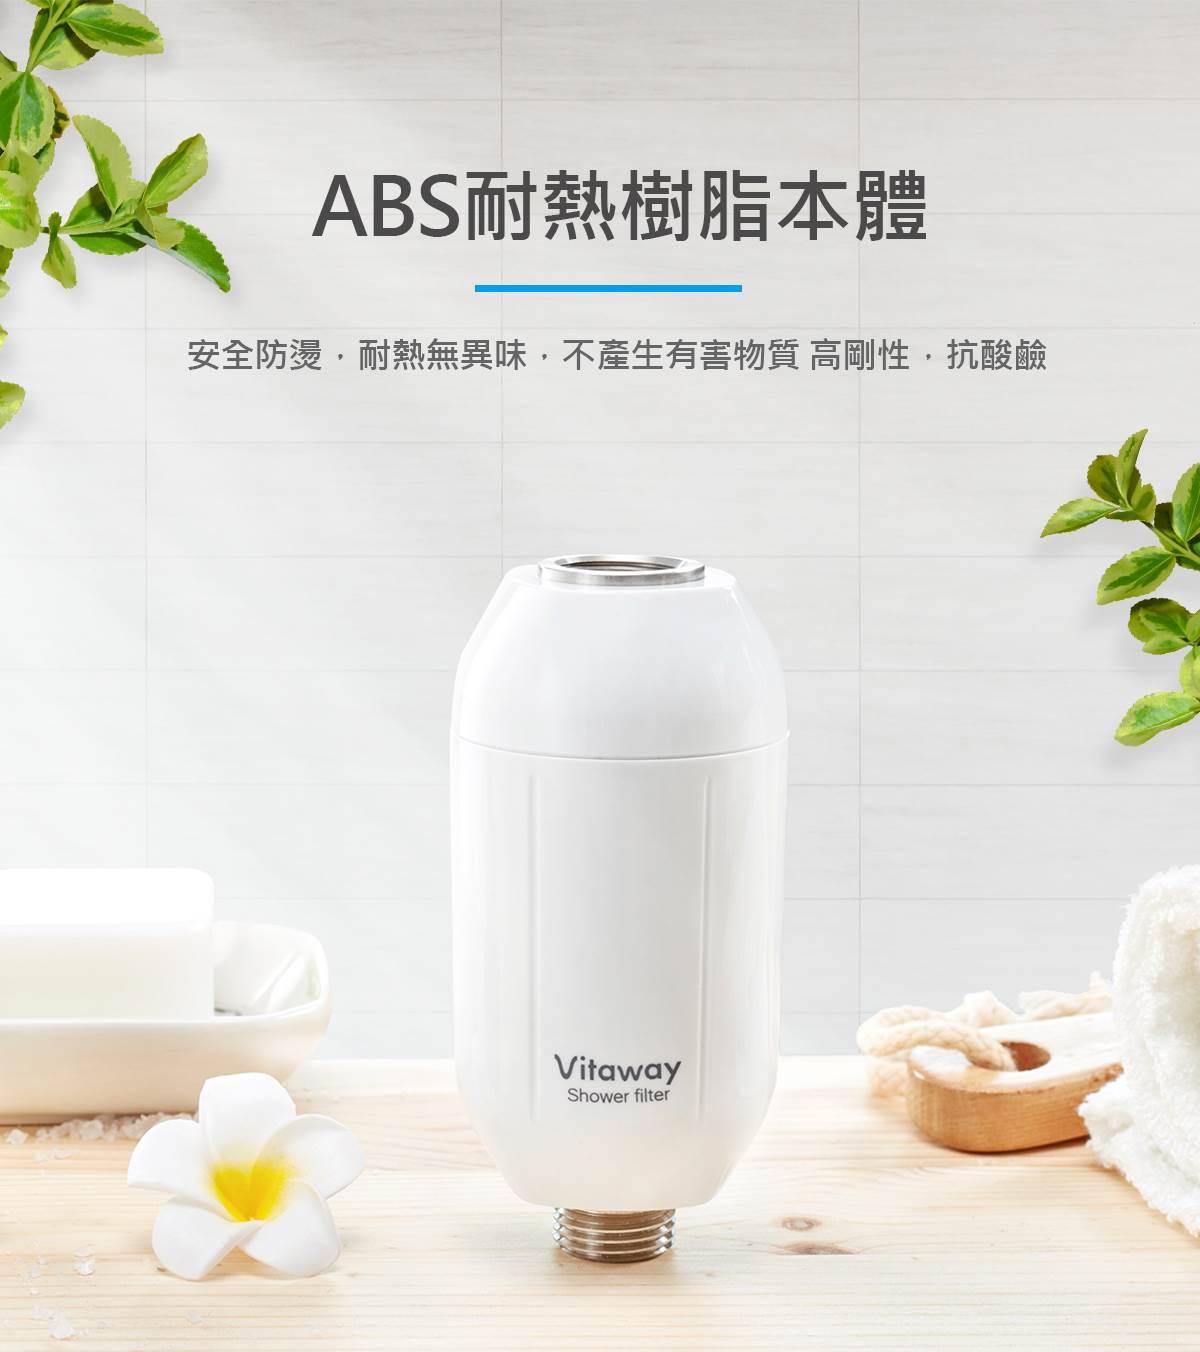 Vitaway-森林SPA沐浴過濾器-10-ABS耐熱材質